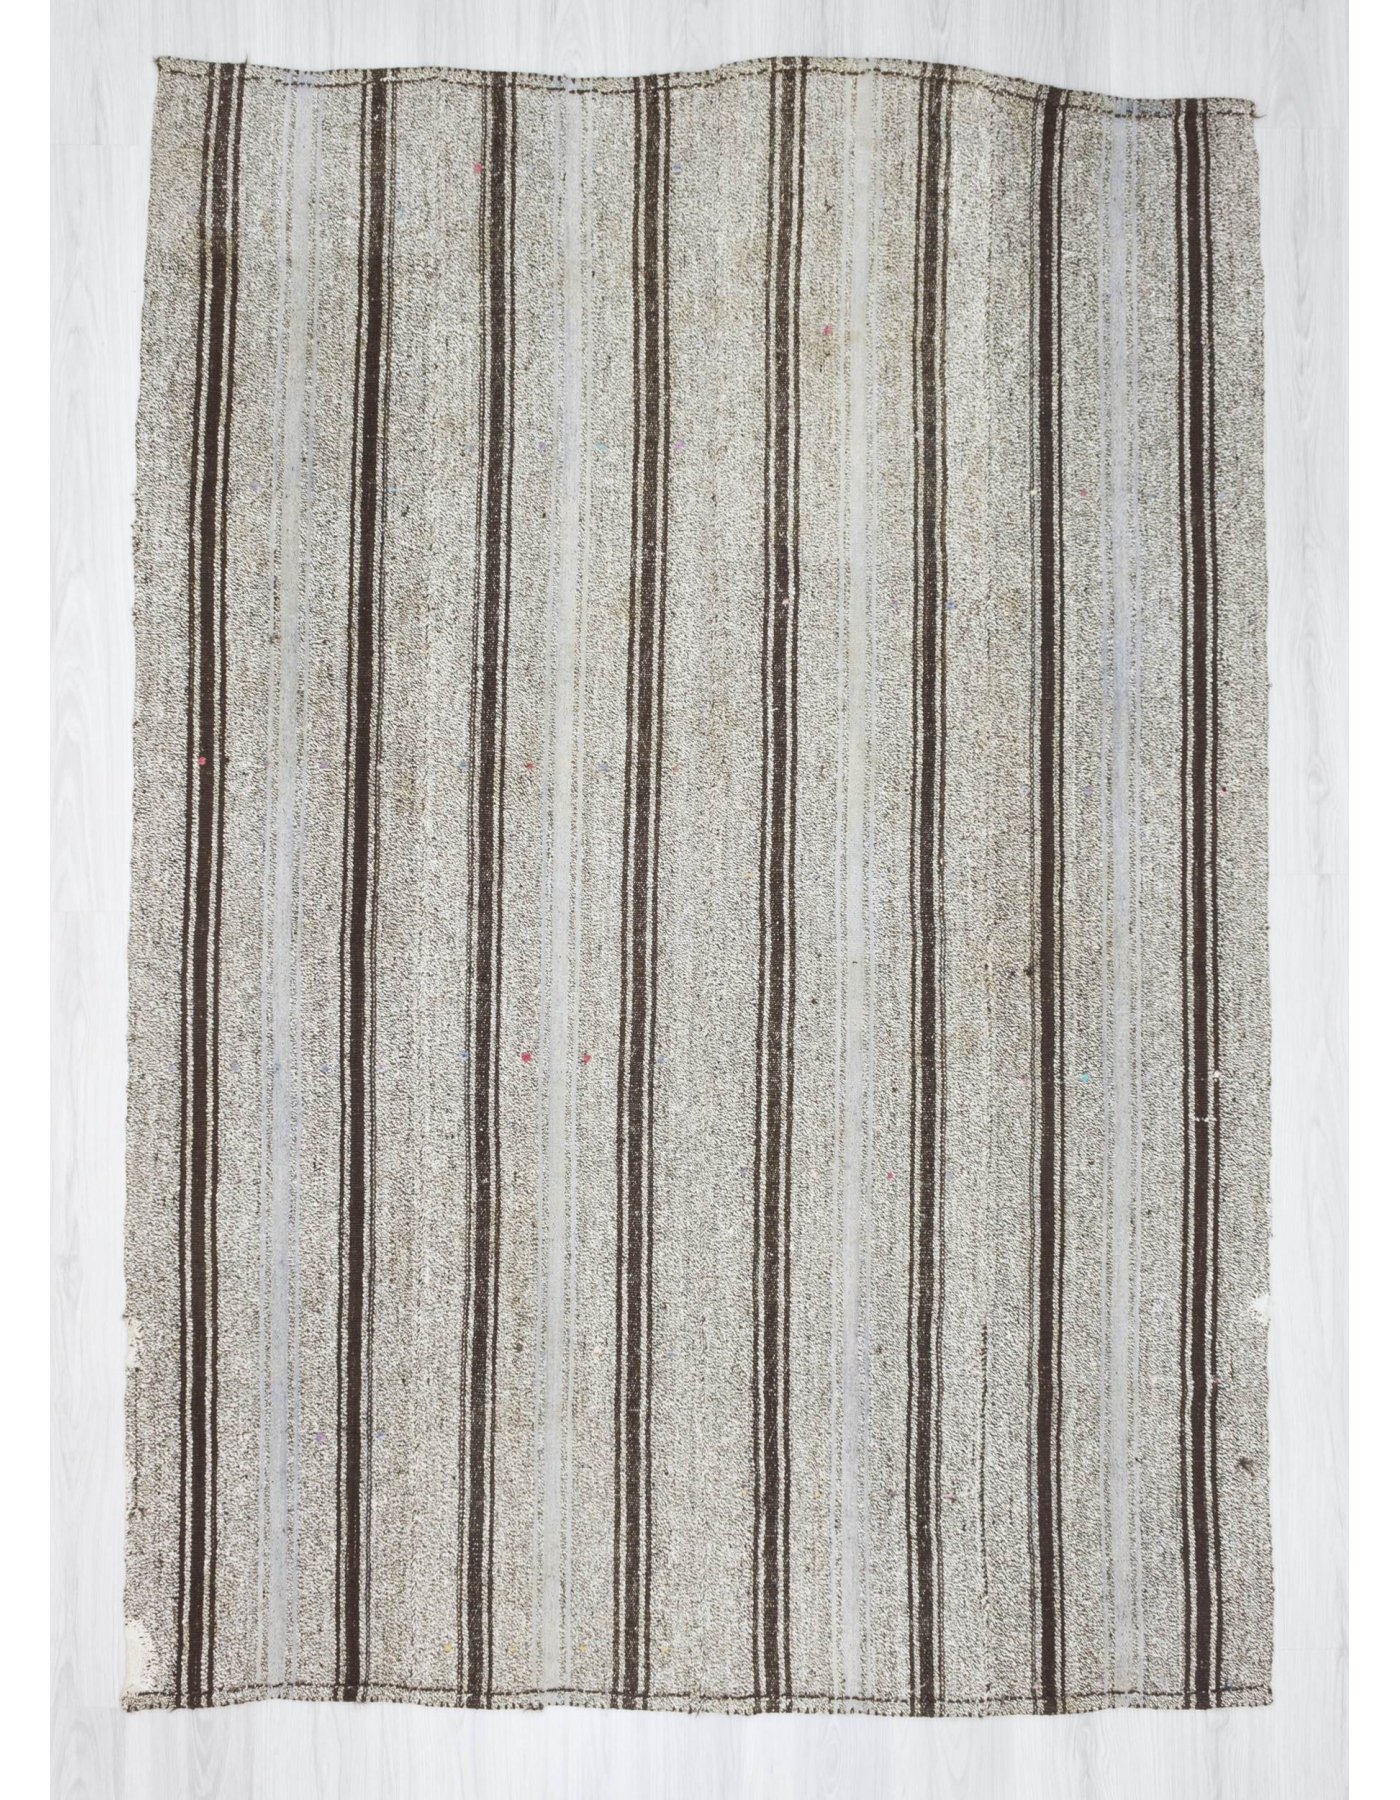 Handwoven Vintage Modern Striped Turkish Kilim Area Rug